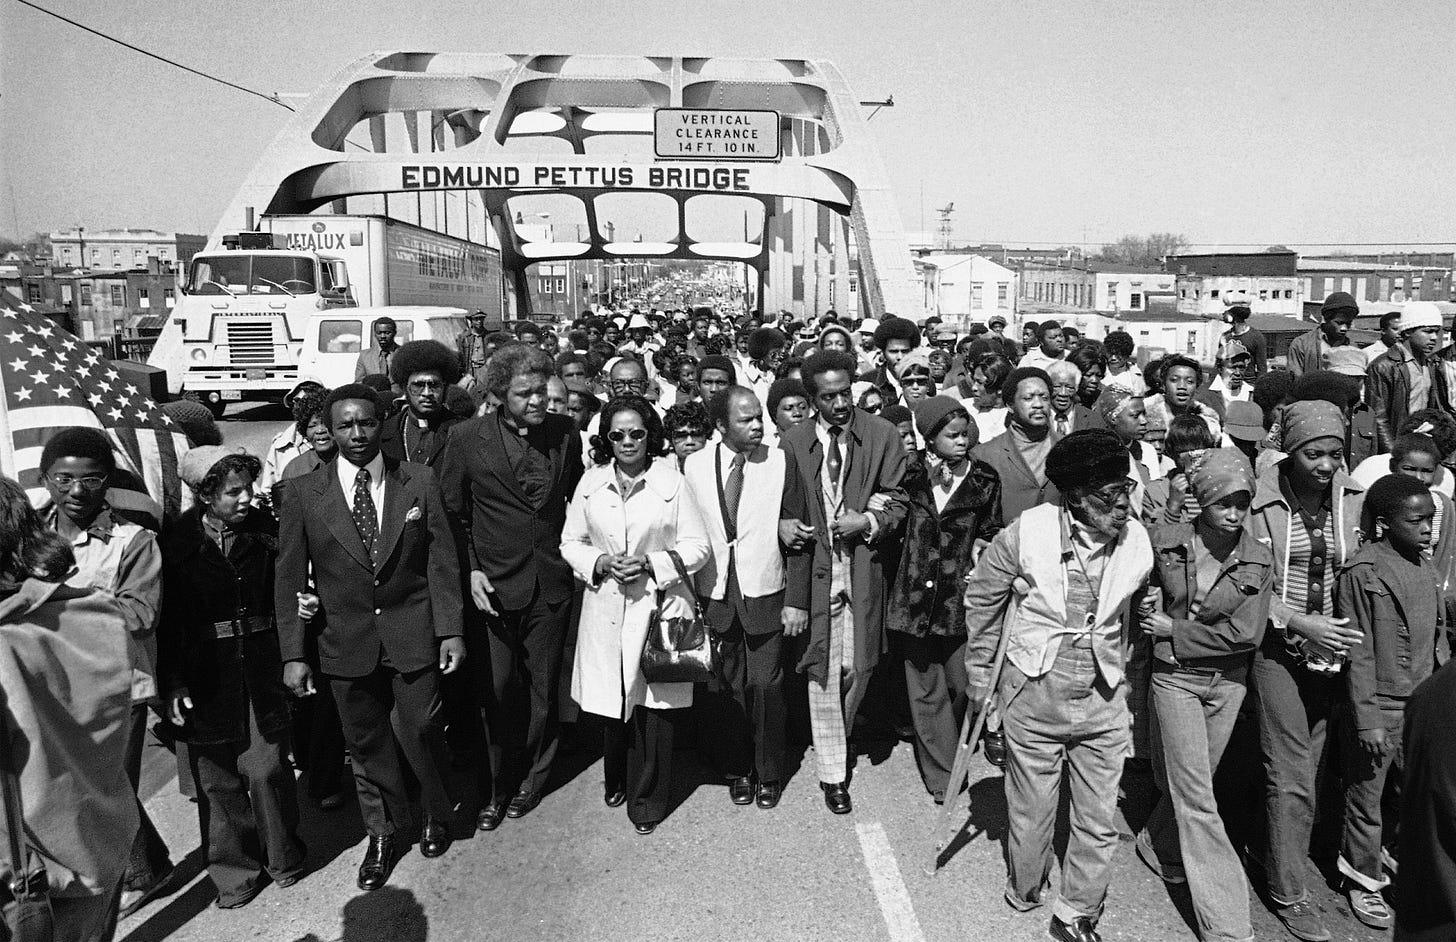 John Lewis Edmund Pettus Bridge civil rights march